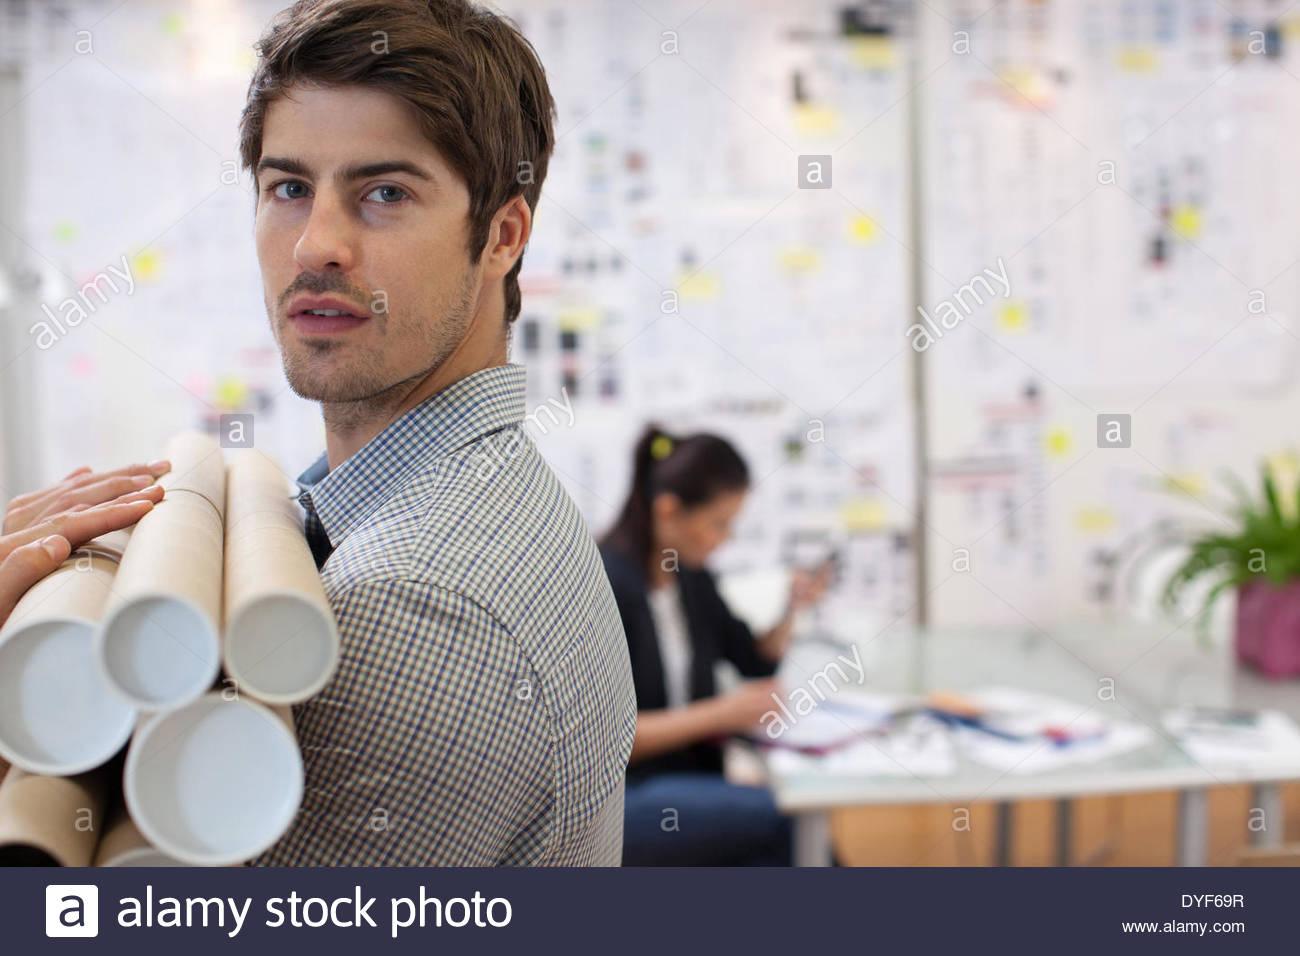 Portrait architect holding blueprint tubes in office - Stock Image